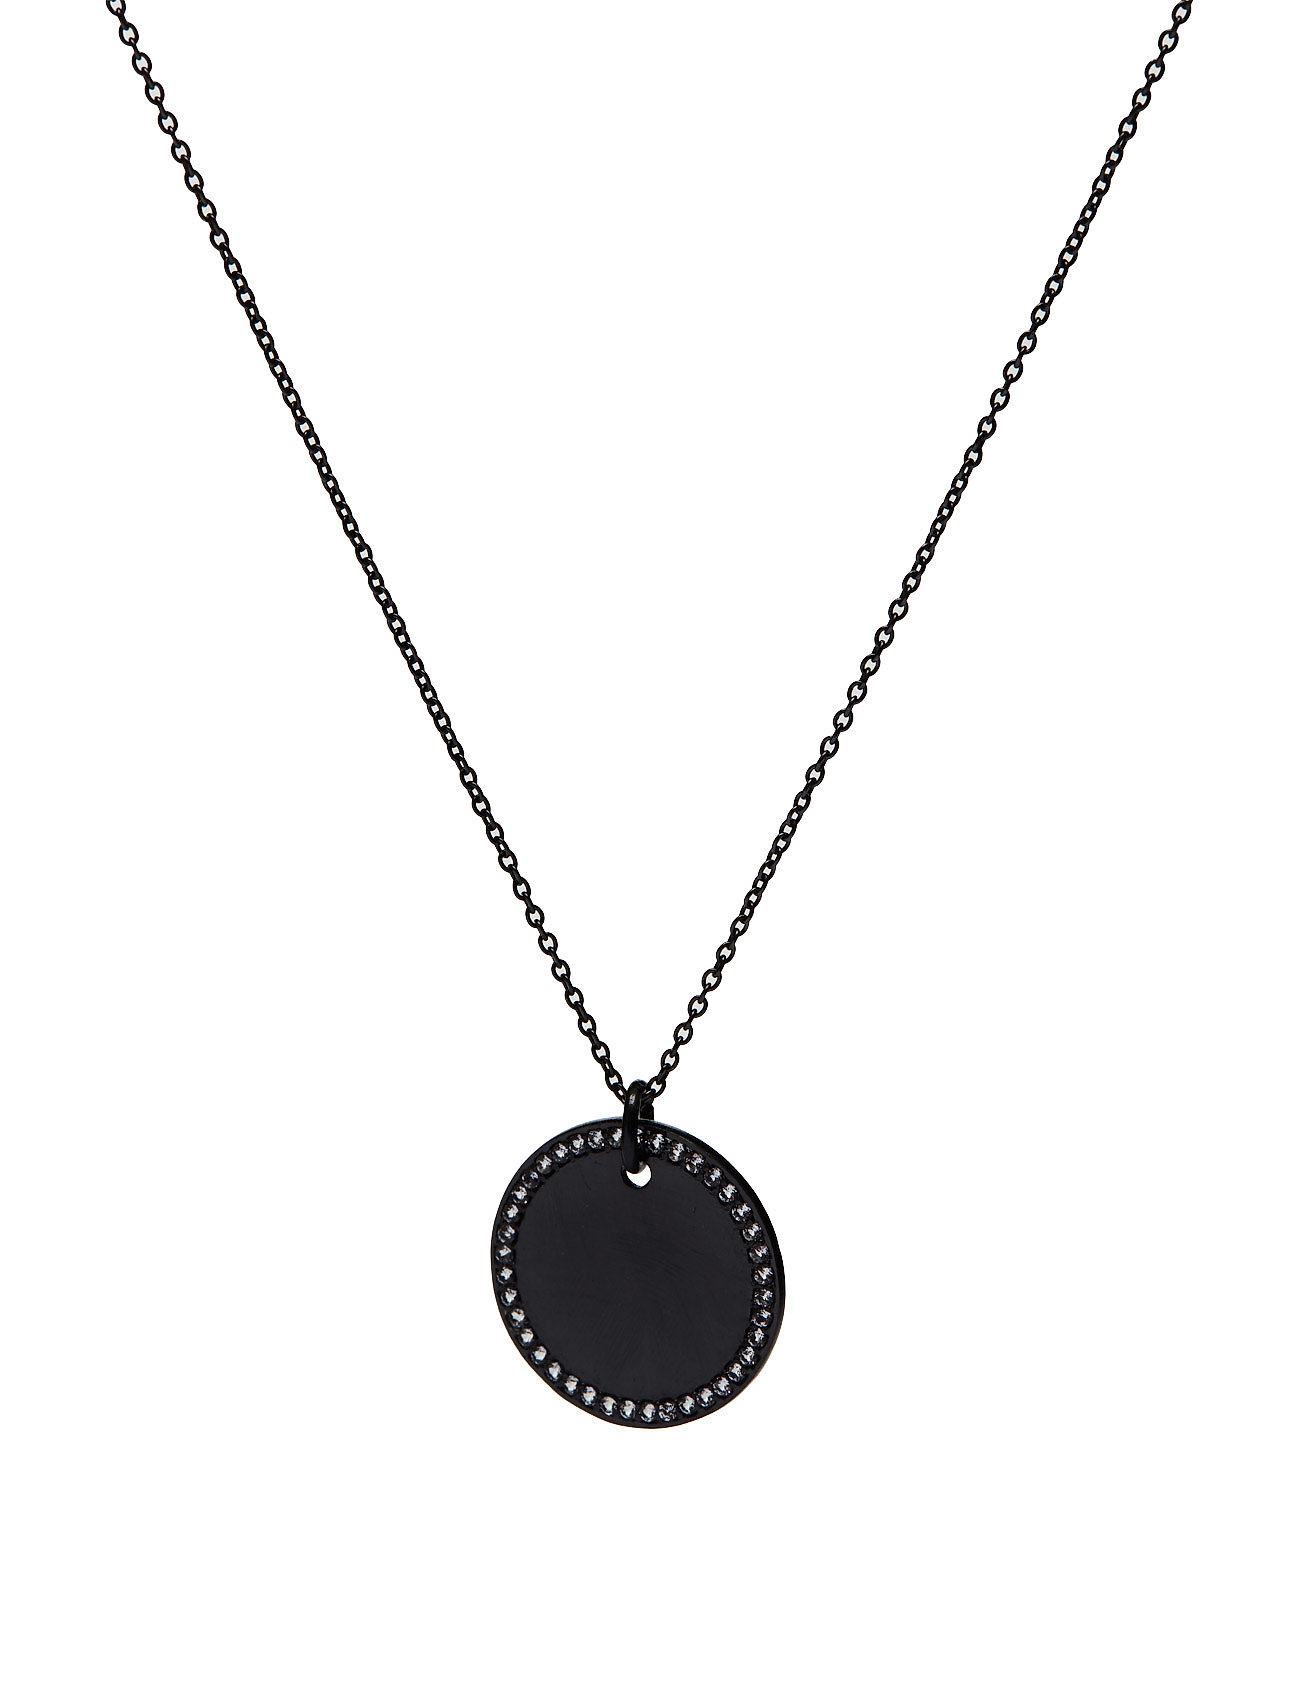 Halo Medalion Necklace - Jewlscph